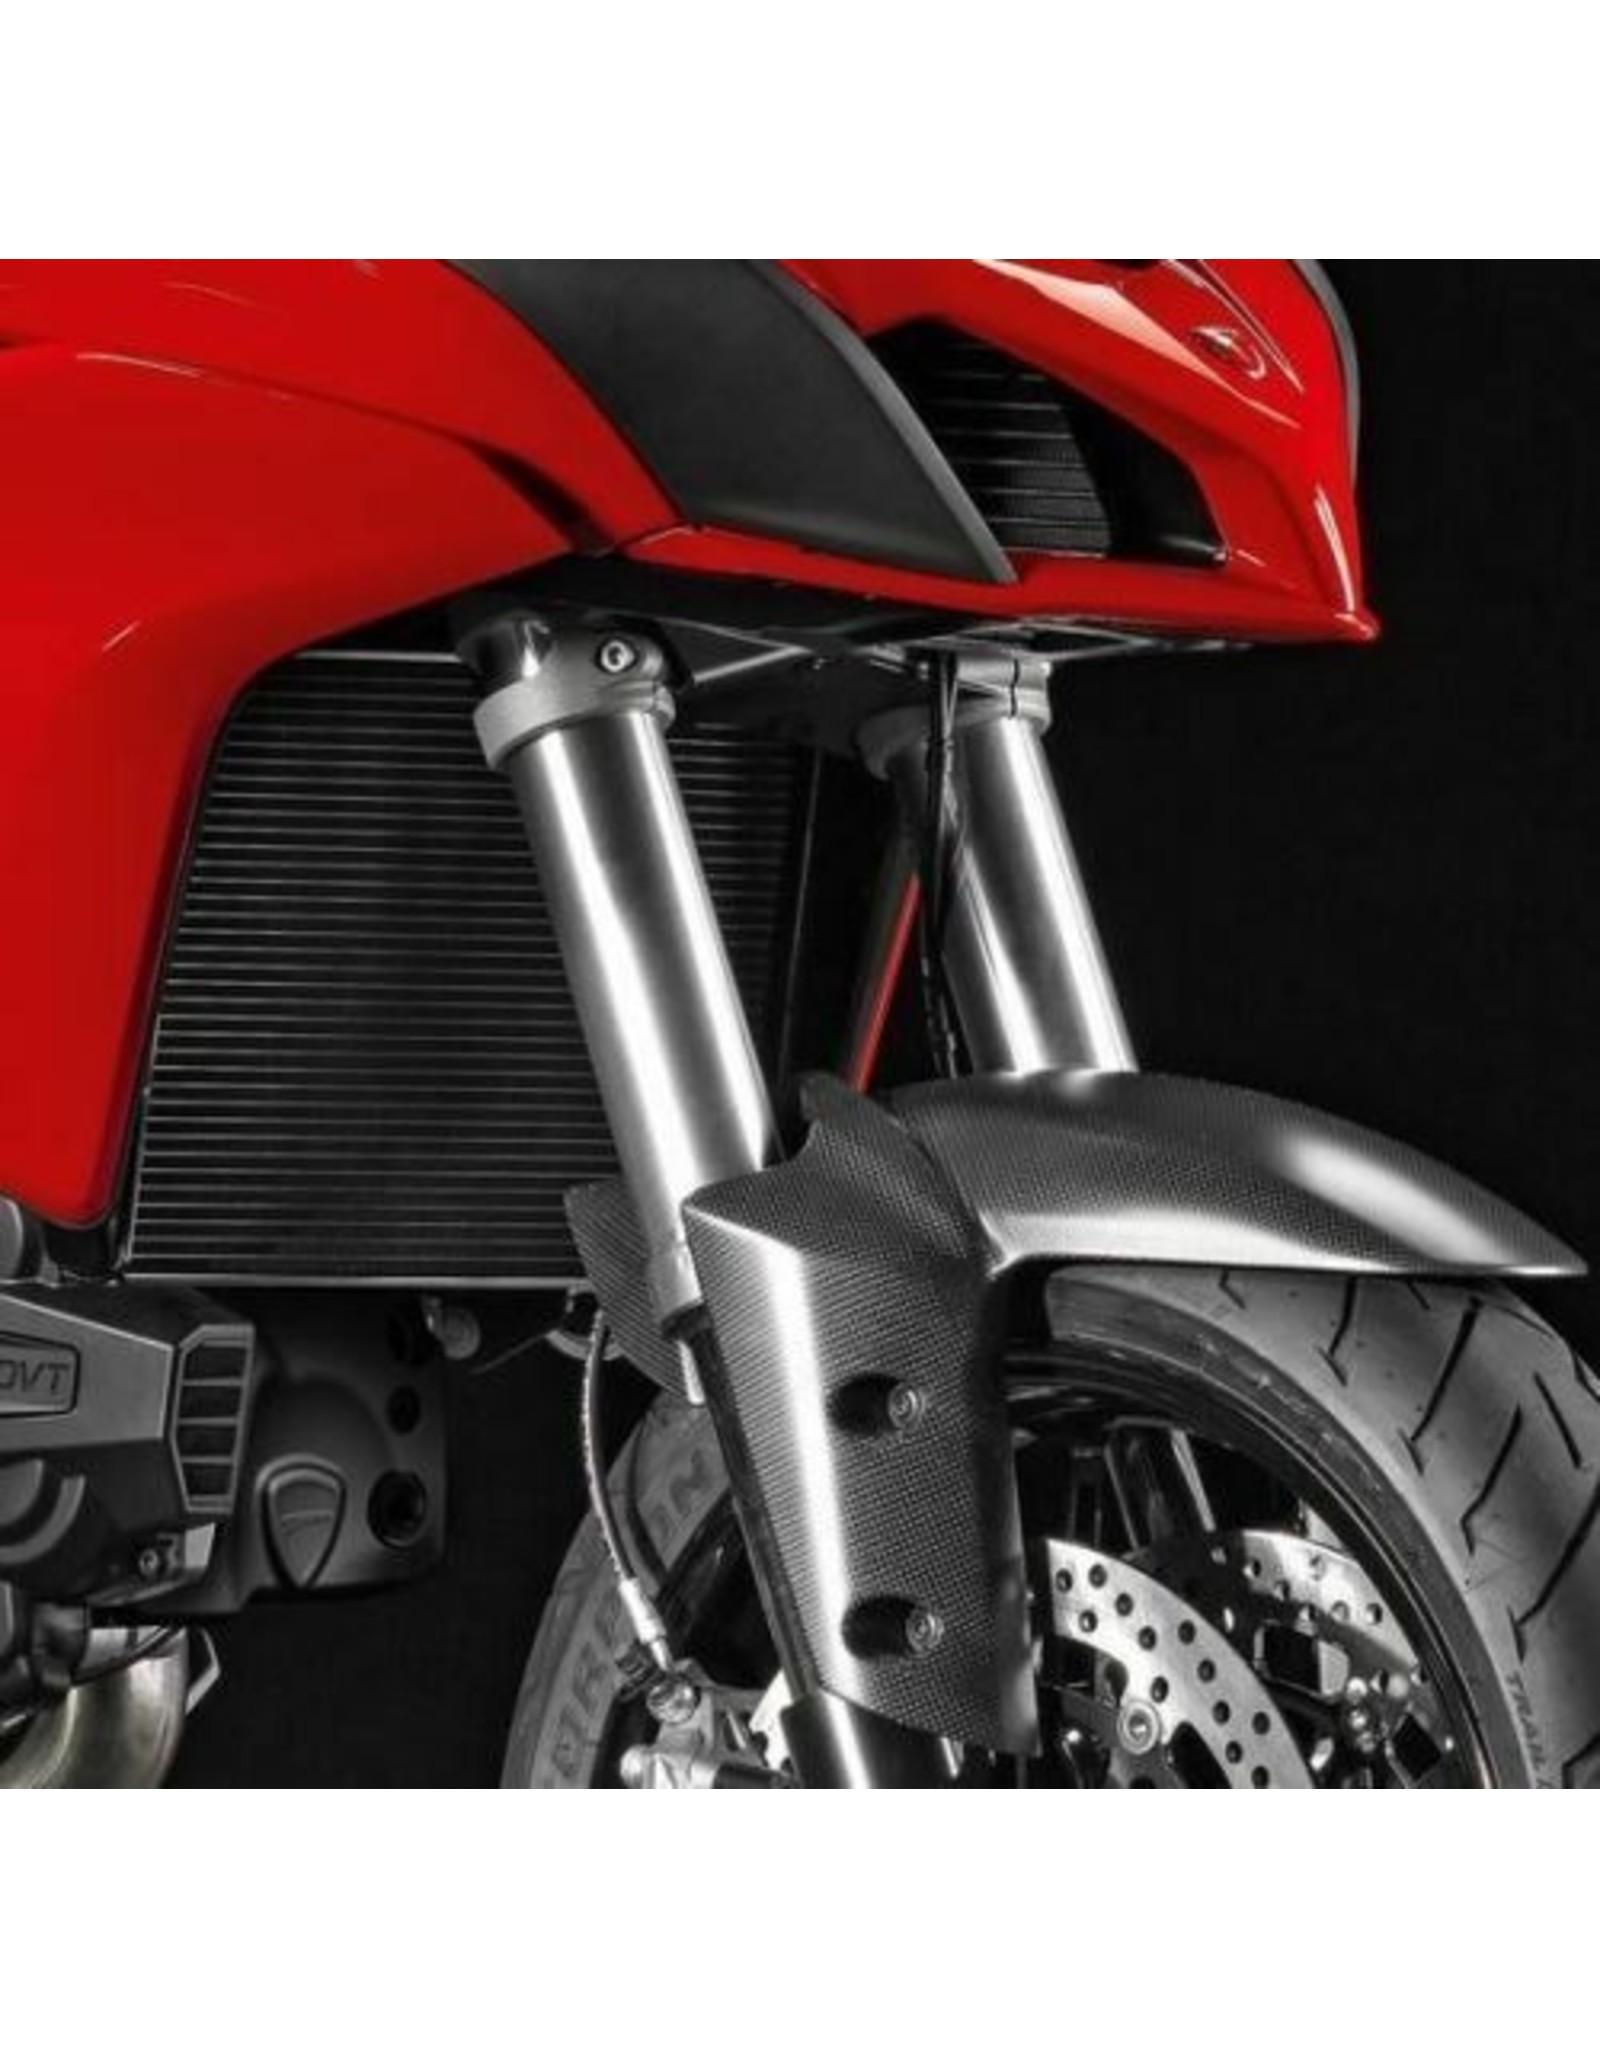 Ducati DUCATI MULTISTRADA SPORT PACKAGE 2015-2017 97980051A